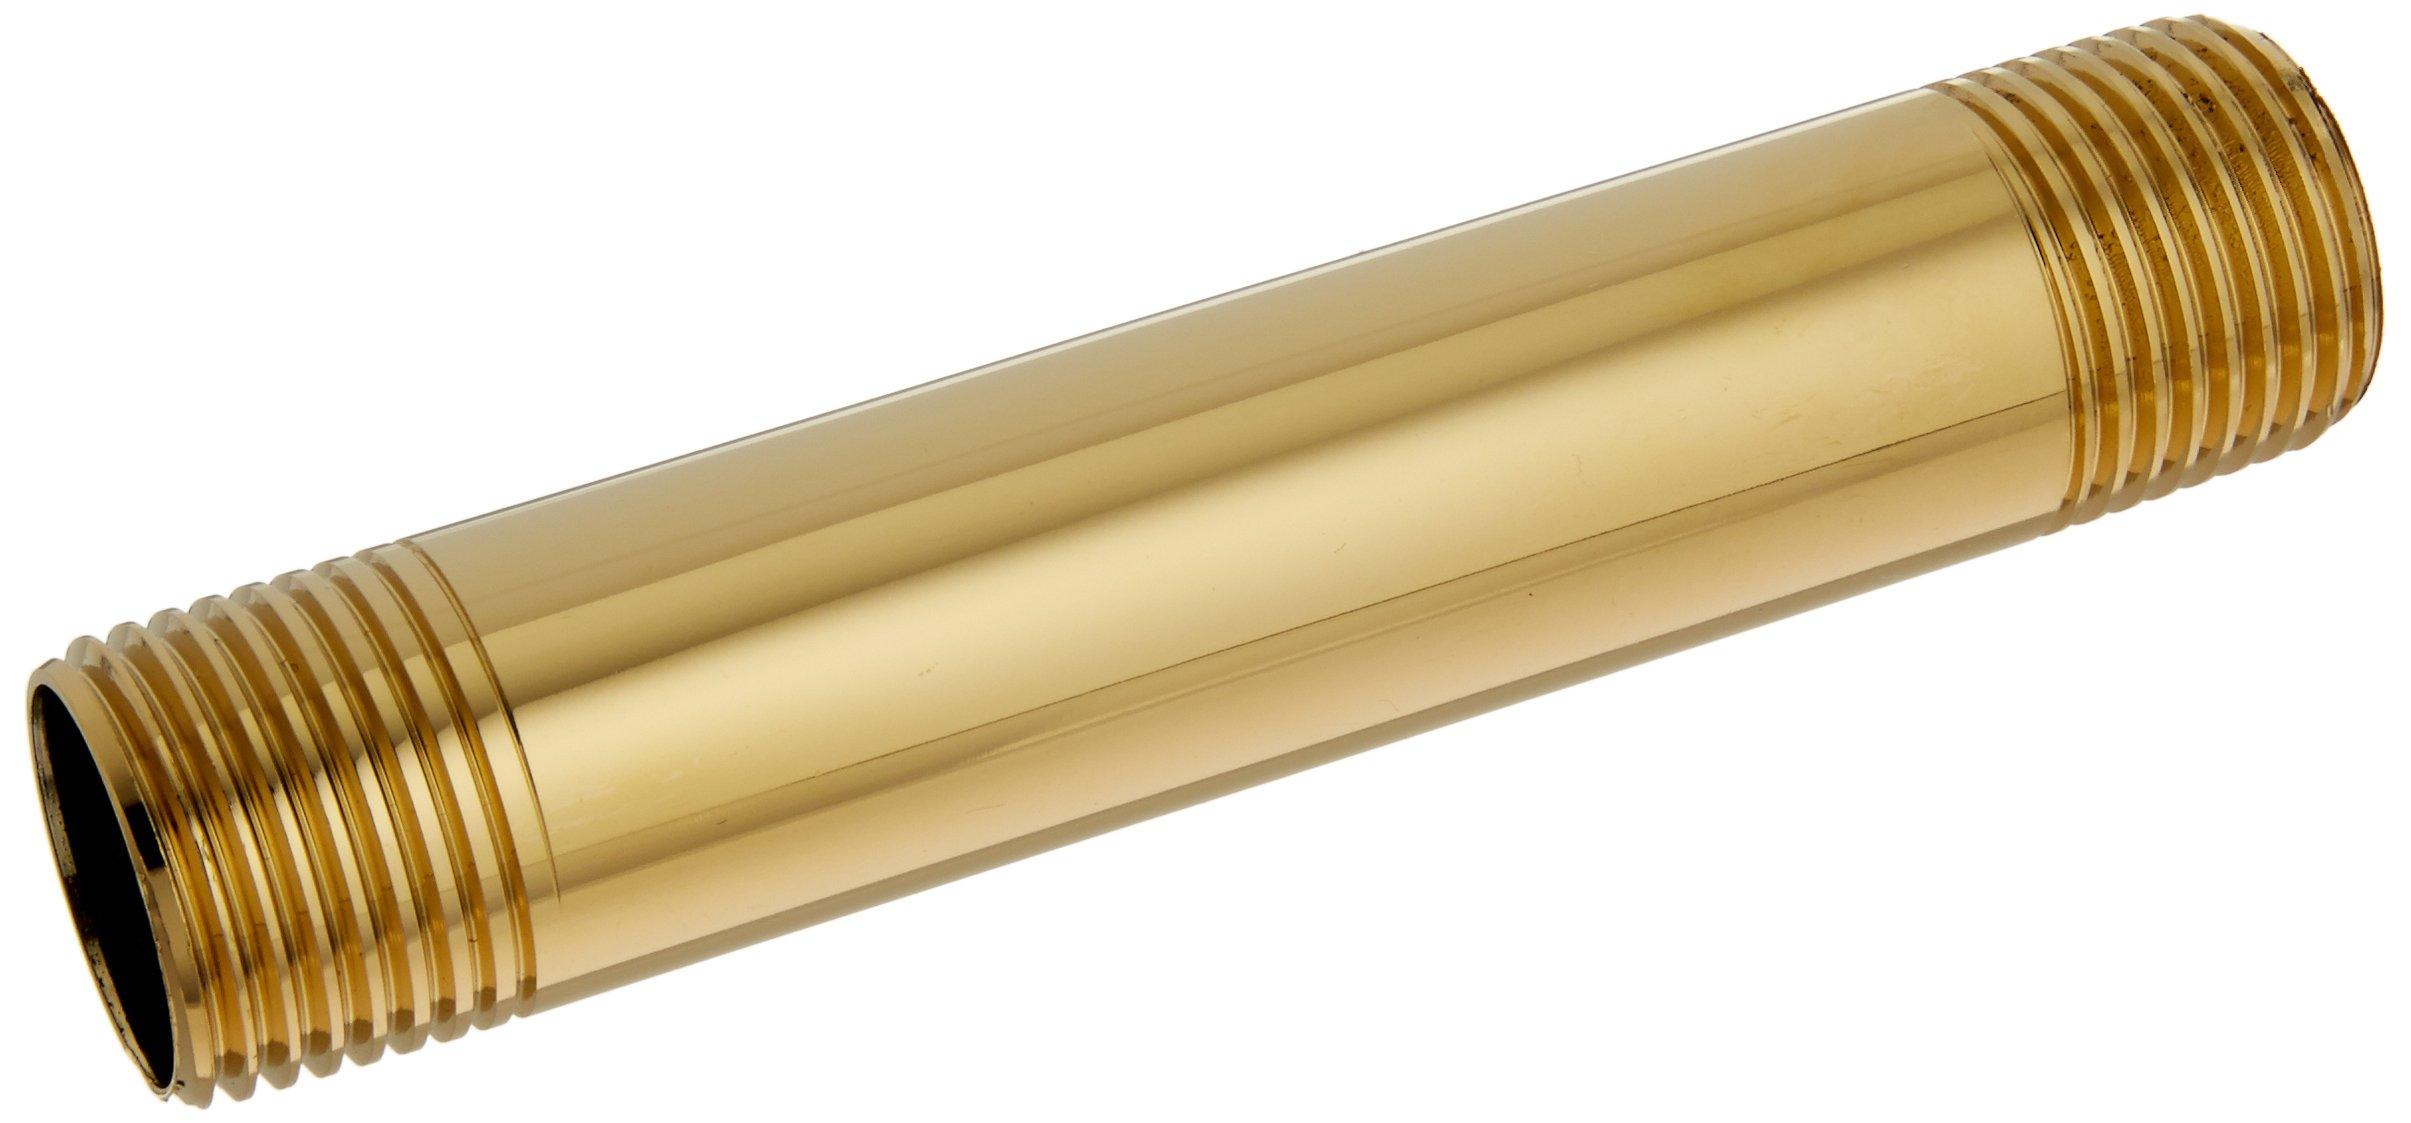 Jones Stephens N17050 1/2 X-Inch 4 Polished Brass Nipples